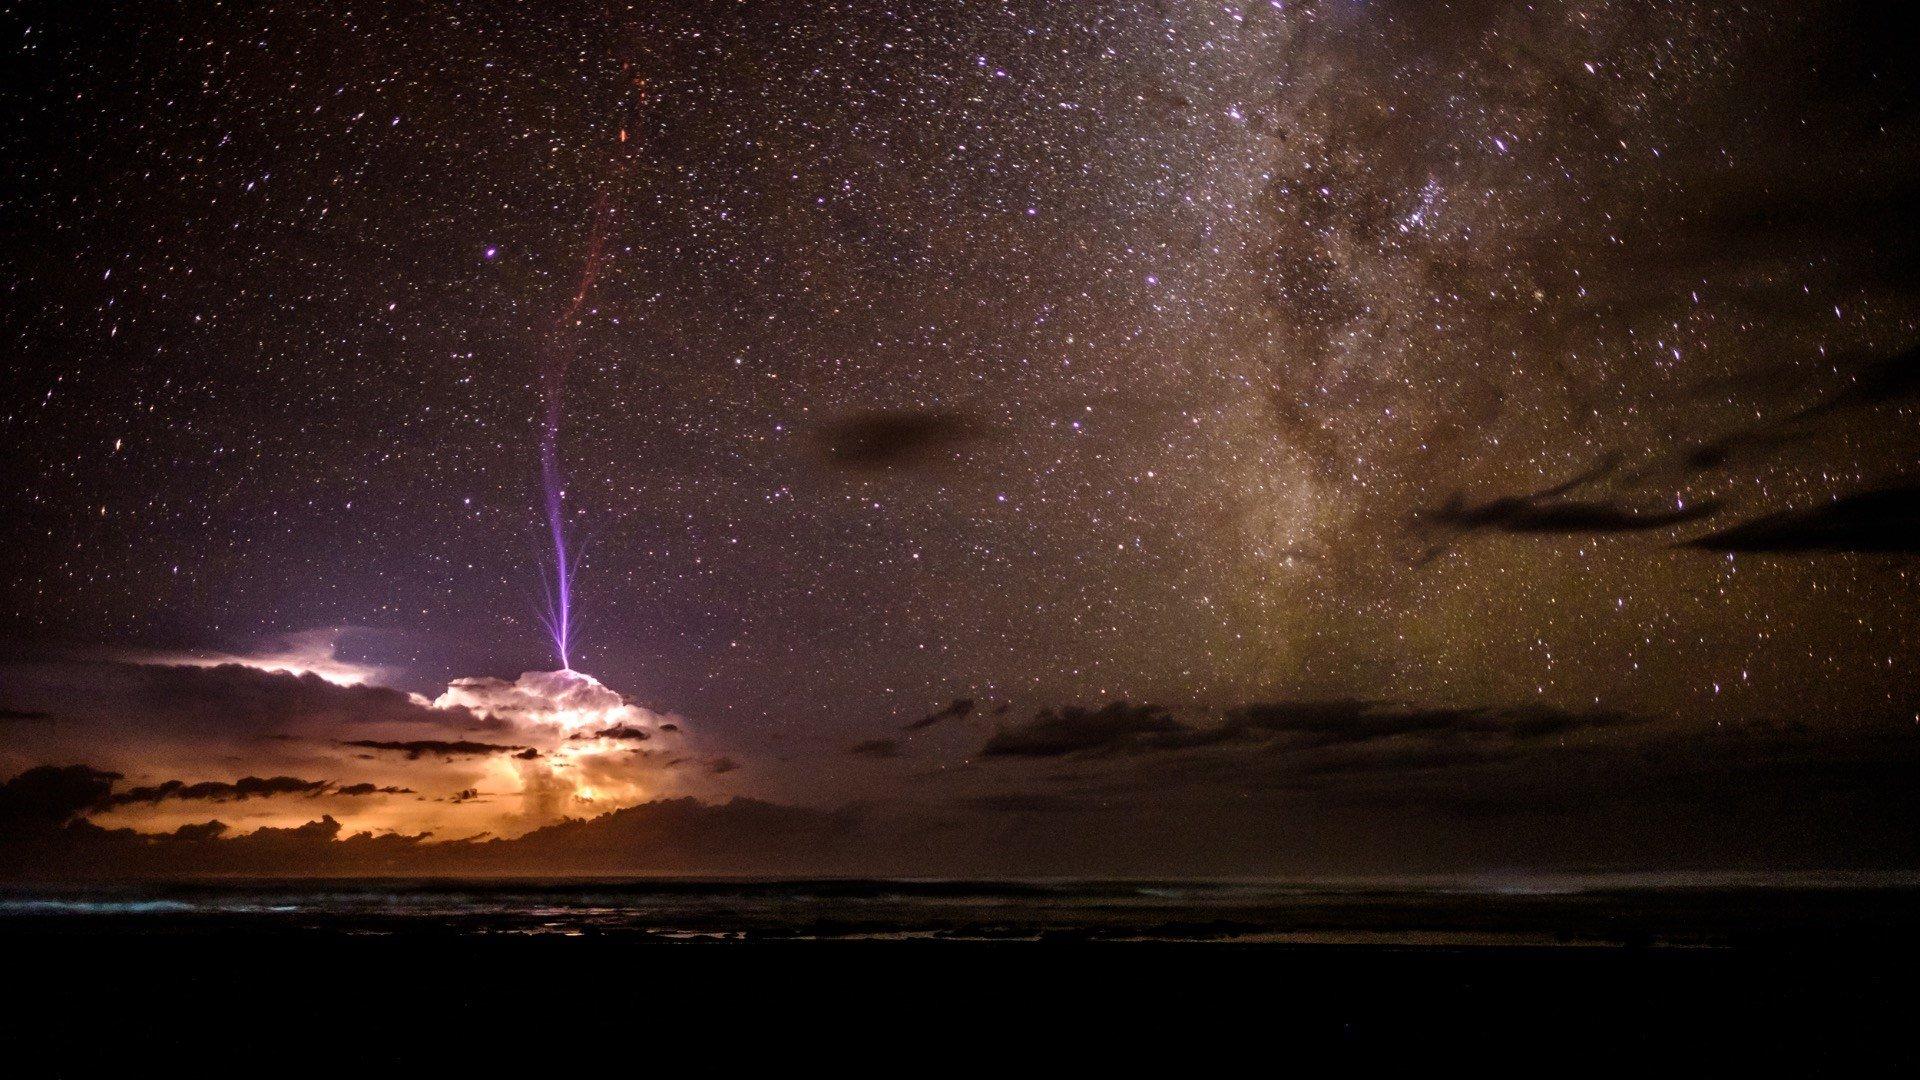 Sprite Lightning. (Source: Ben Cherry Photography)